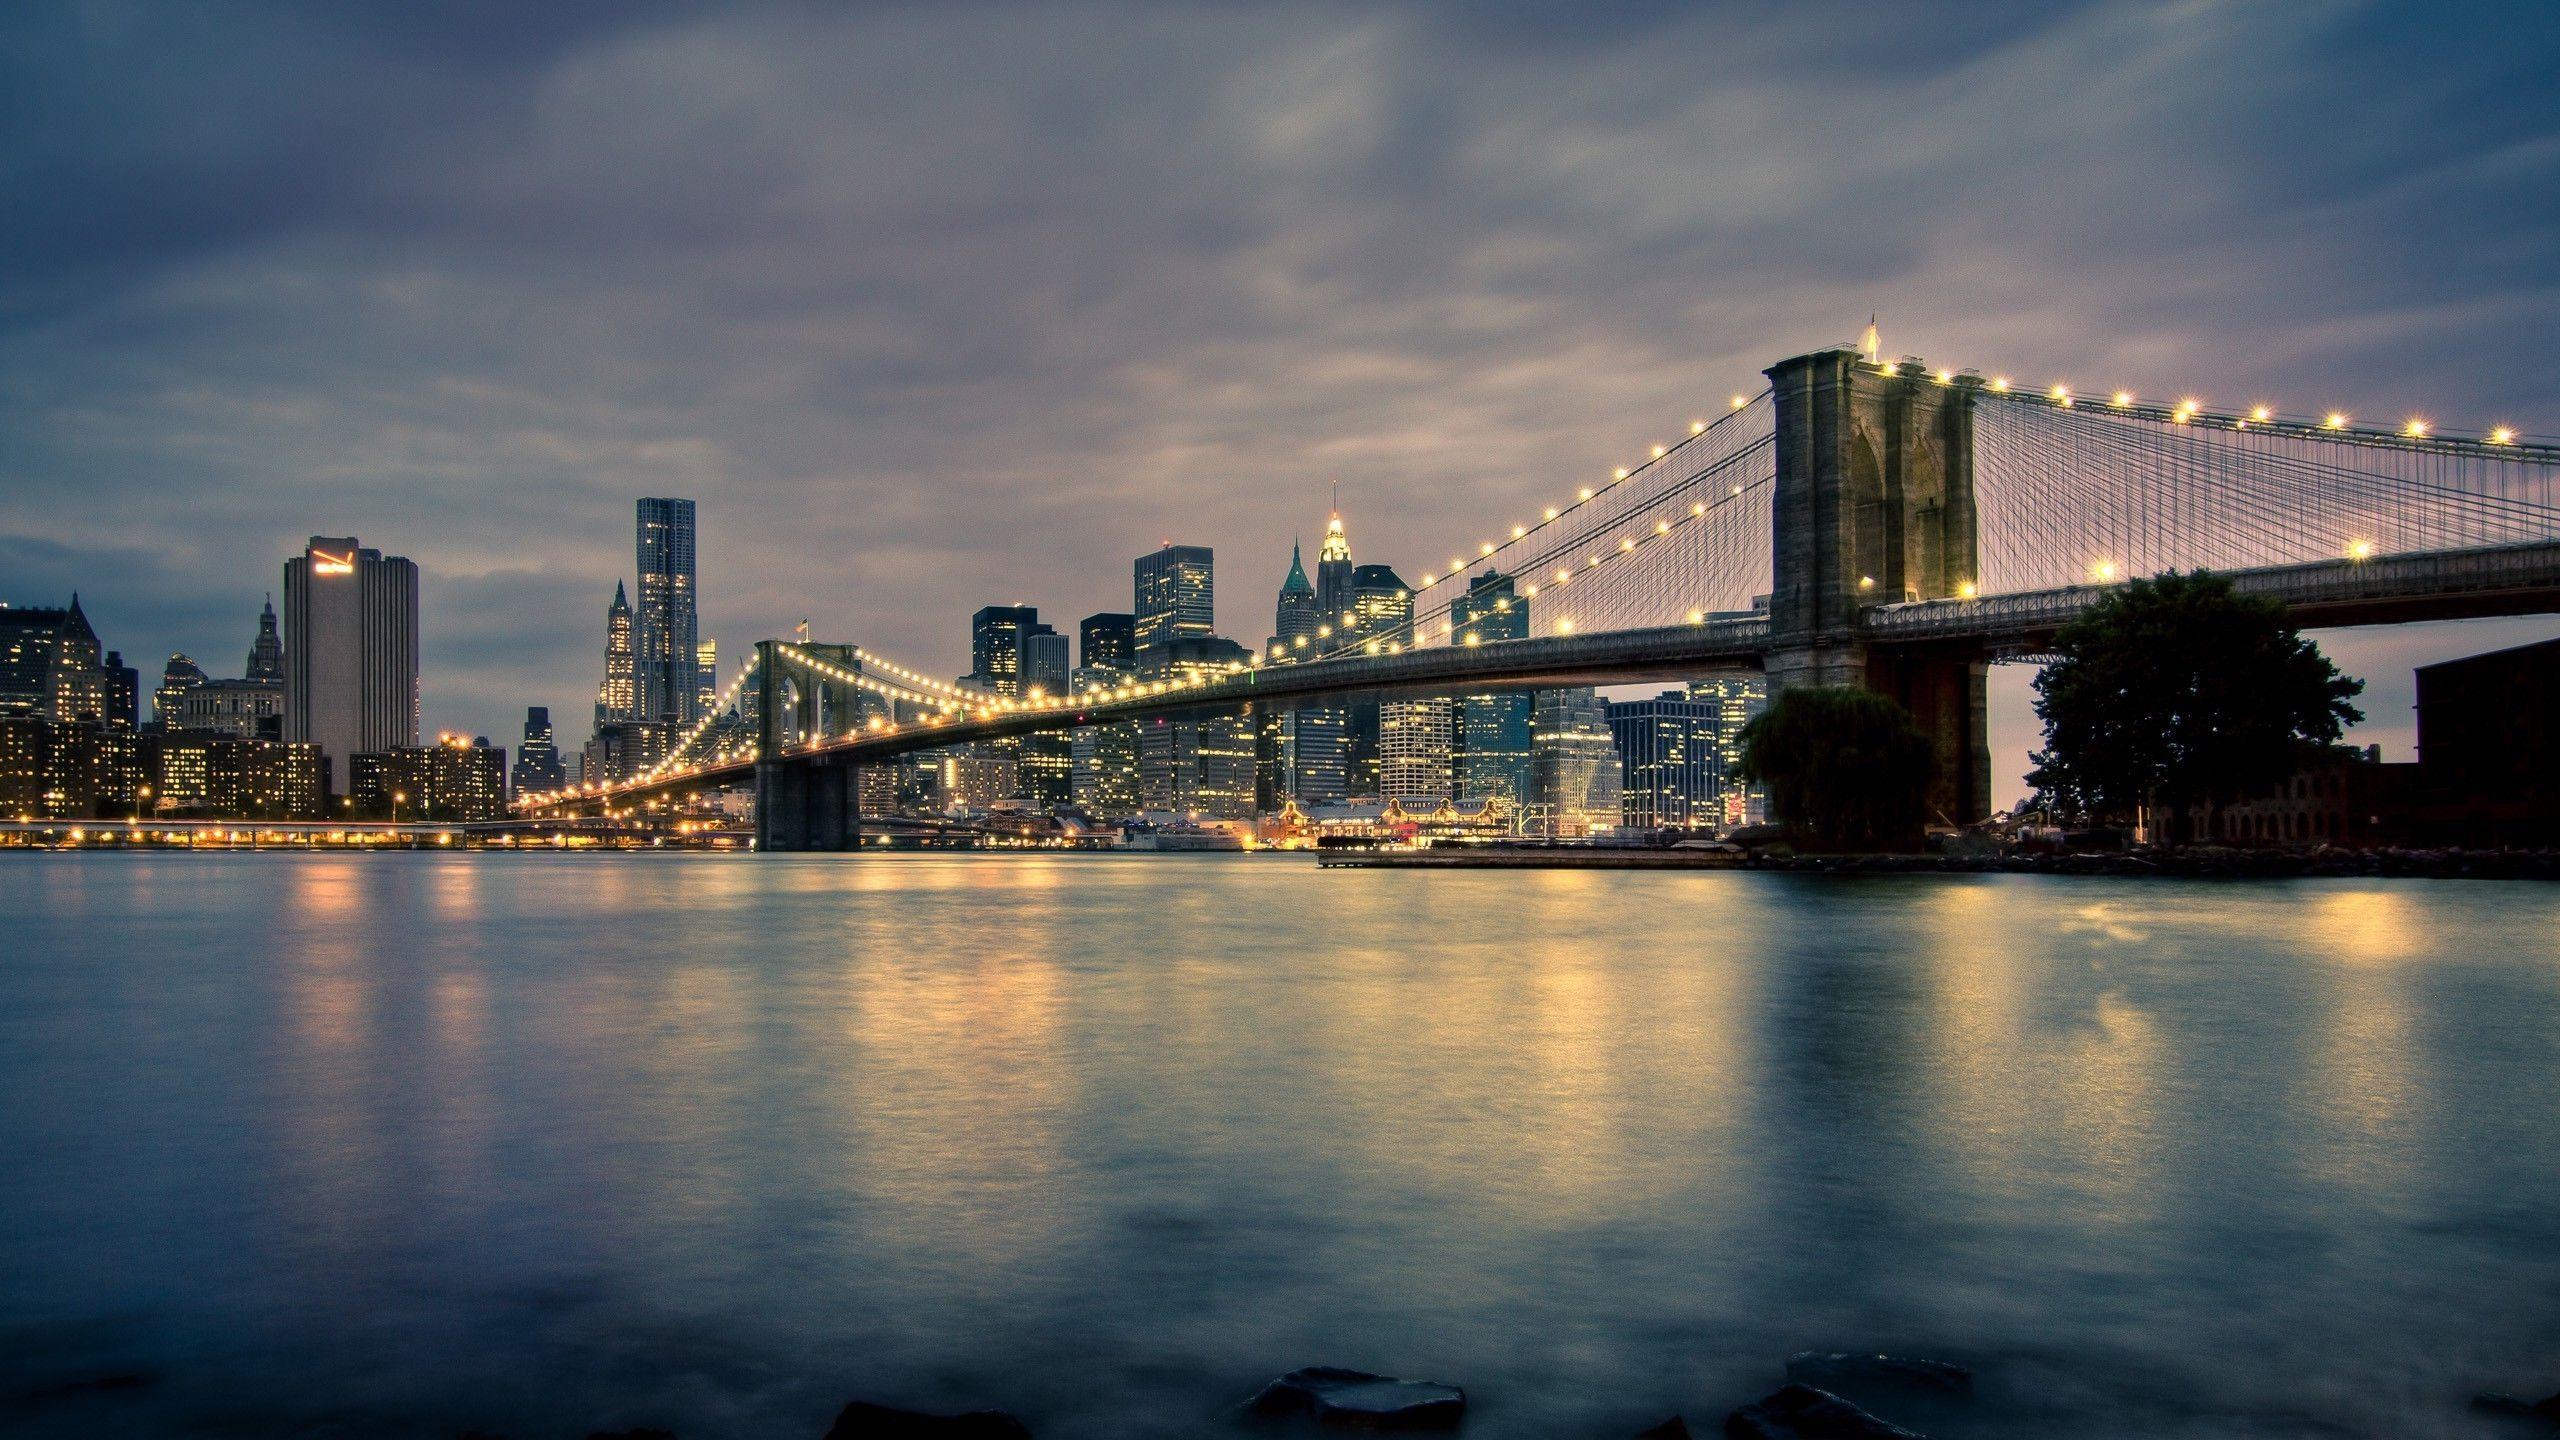 Brooklyn Bridge Wallpaper Free Download Brooklyn Bridge Pictures Brooklyn Bridge Wallpaper Brooklyn Bridge